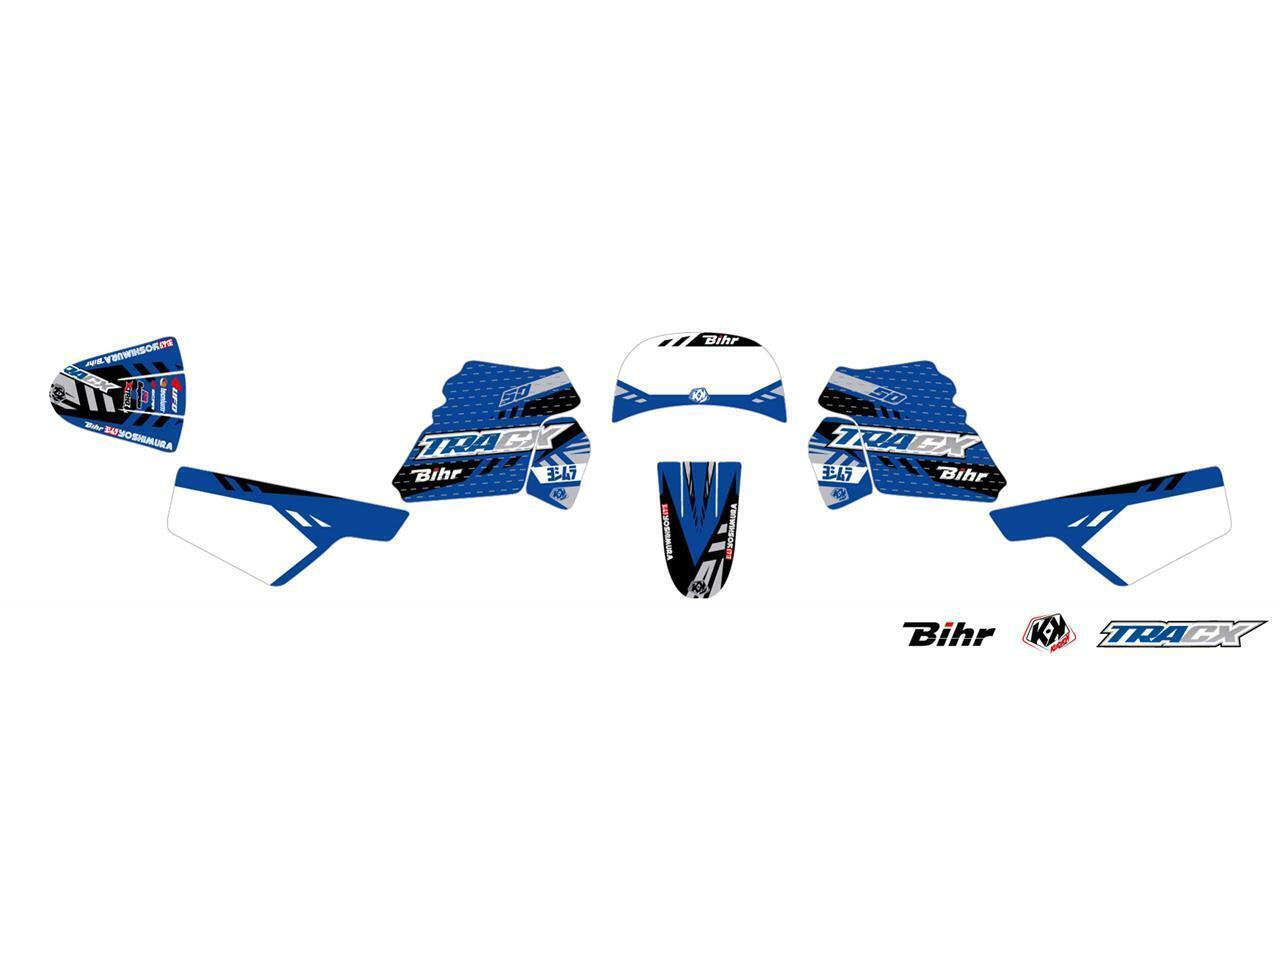 Satz Deko Kutvek Tracx blau Yamaha PW50 1983 à 2019  | Hochwertige Produkte